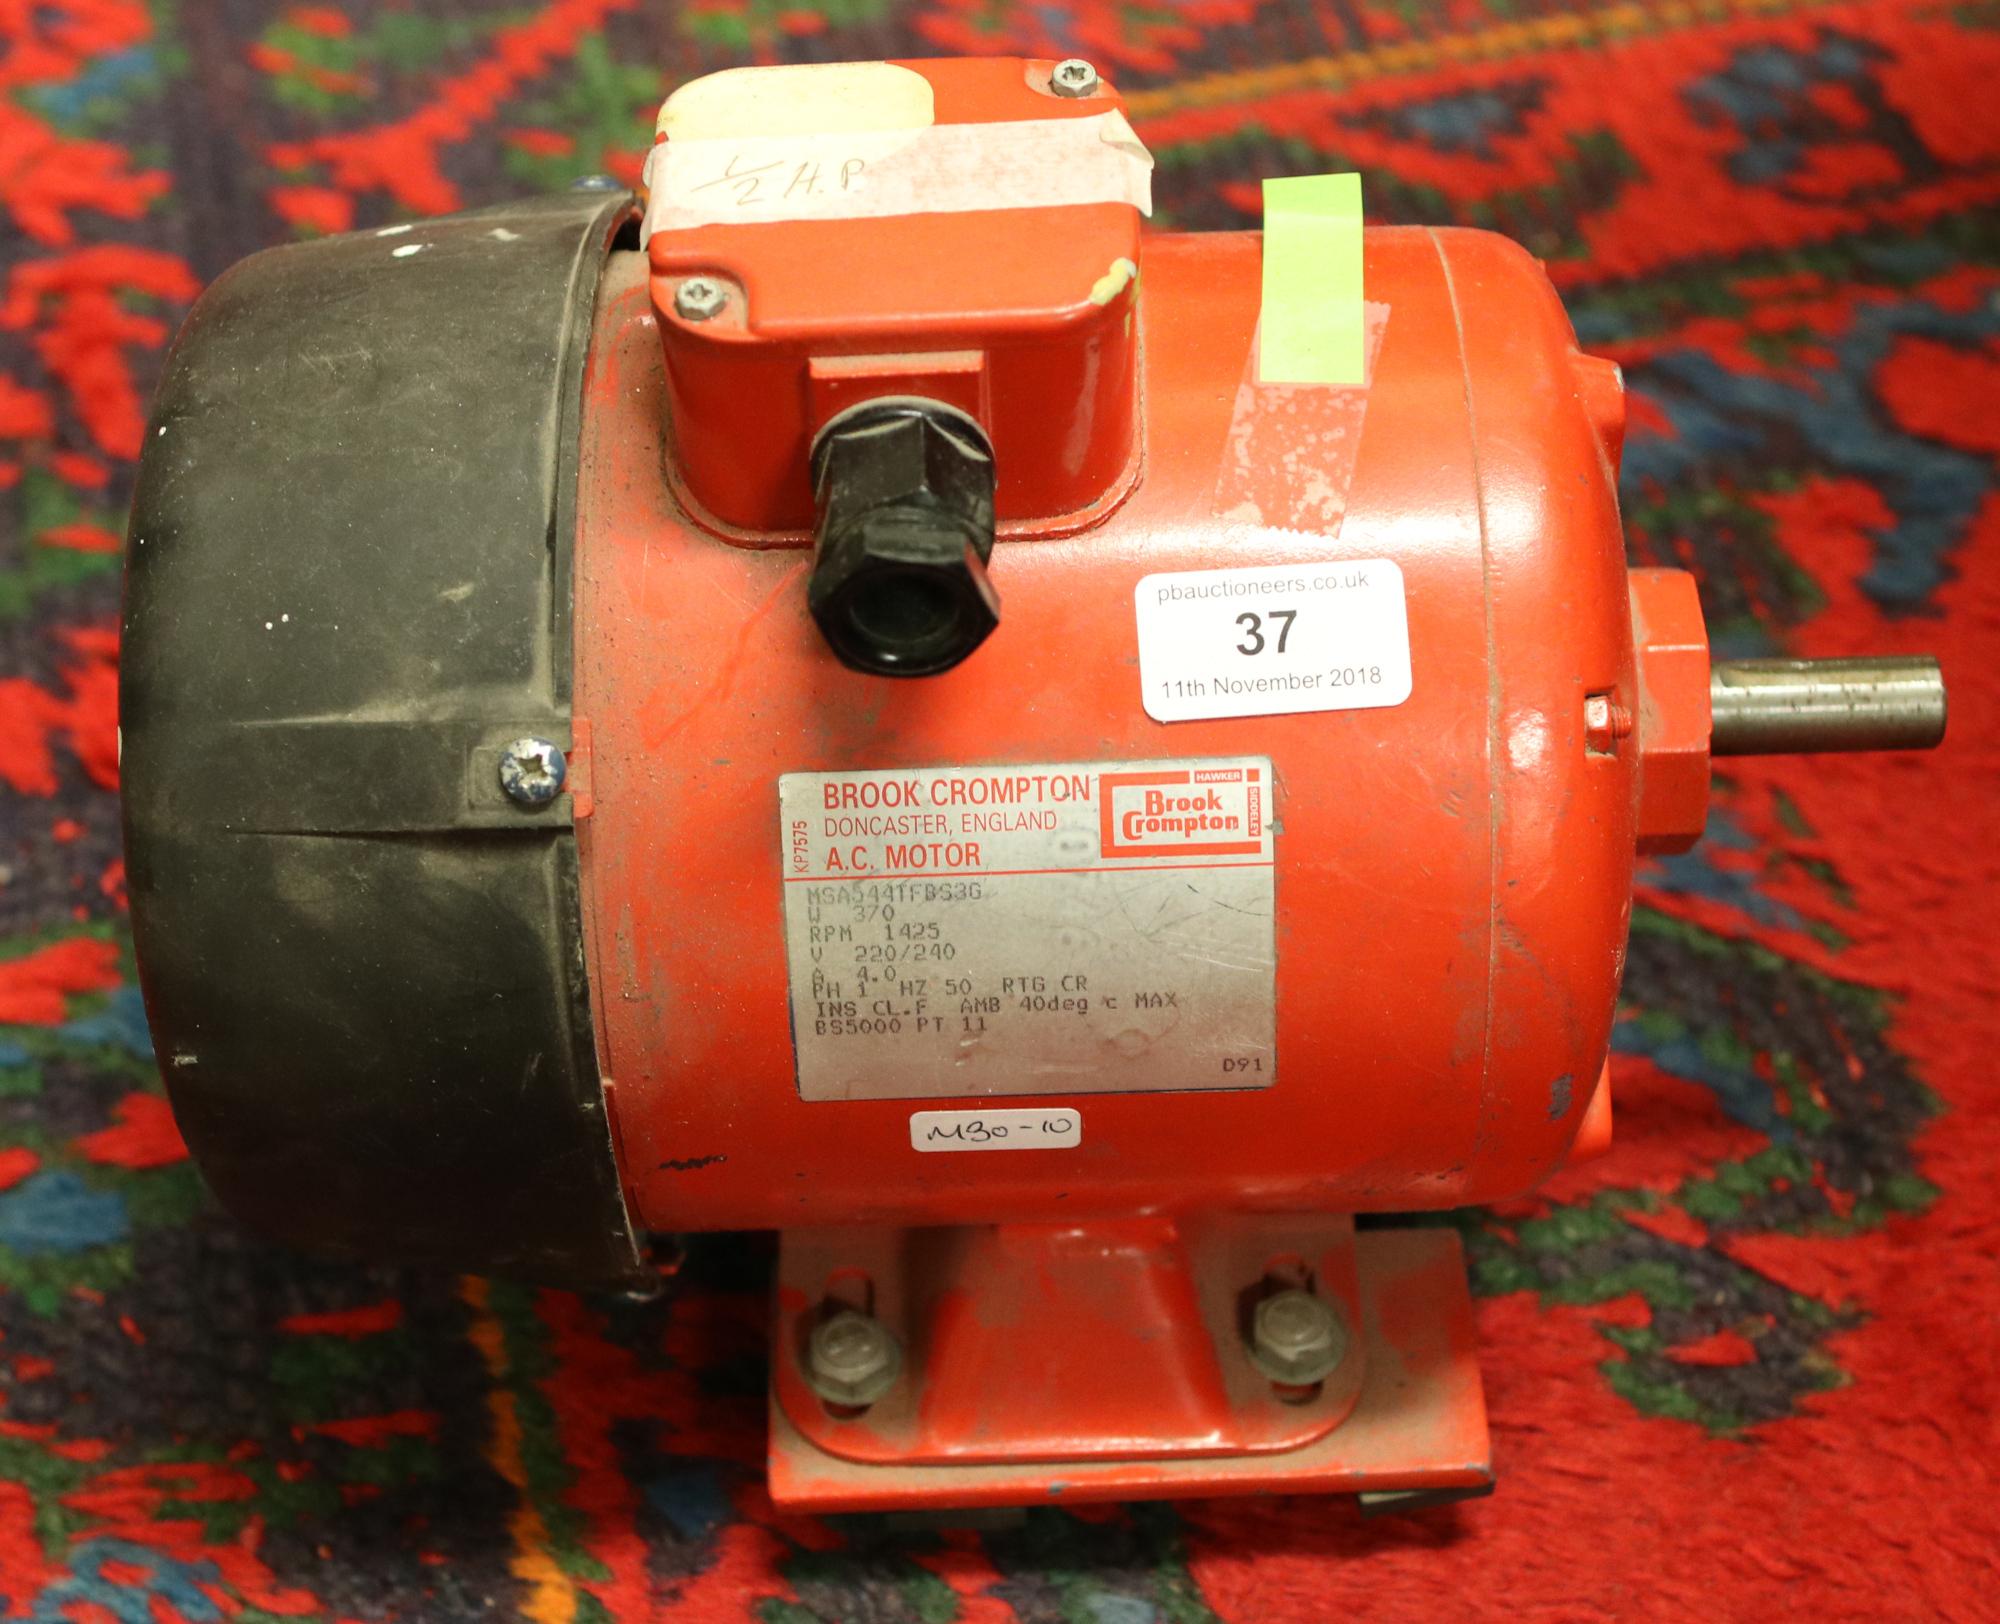 Lot 37 - A Brook Crompton 220 volt induction electric motor.